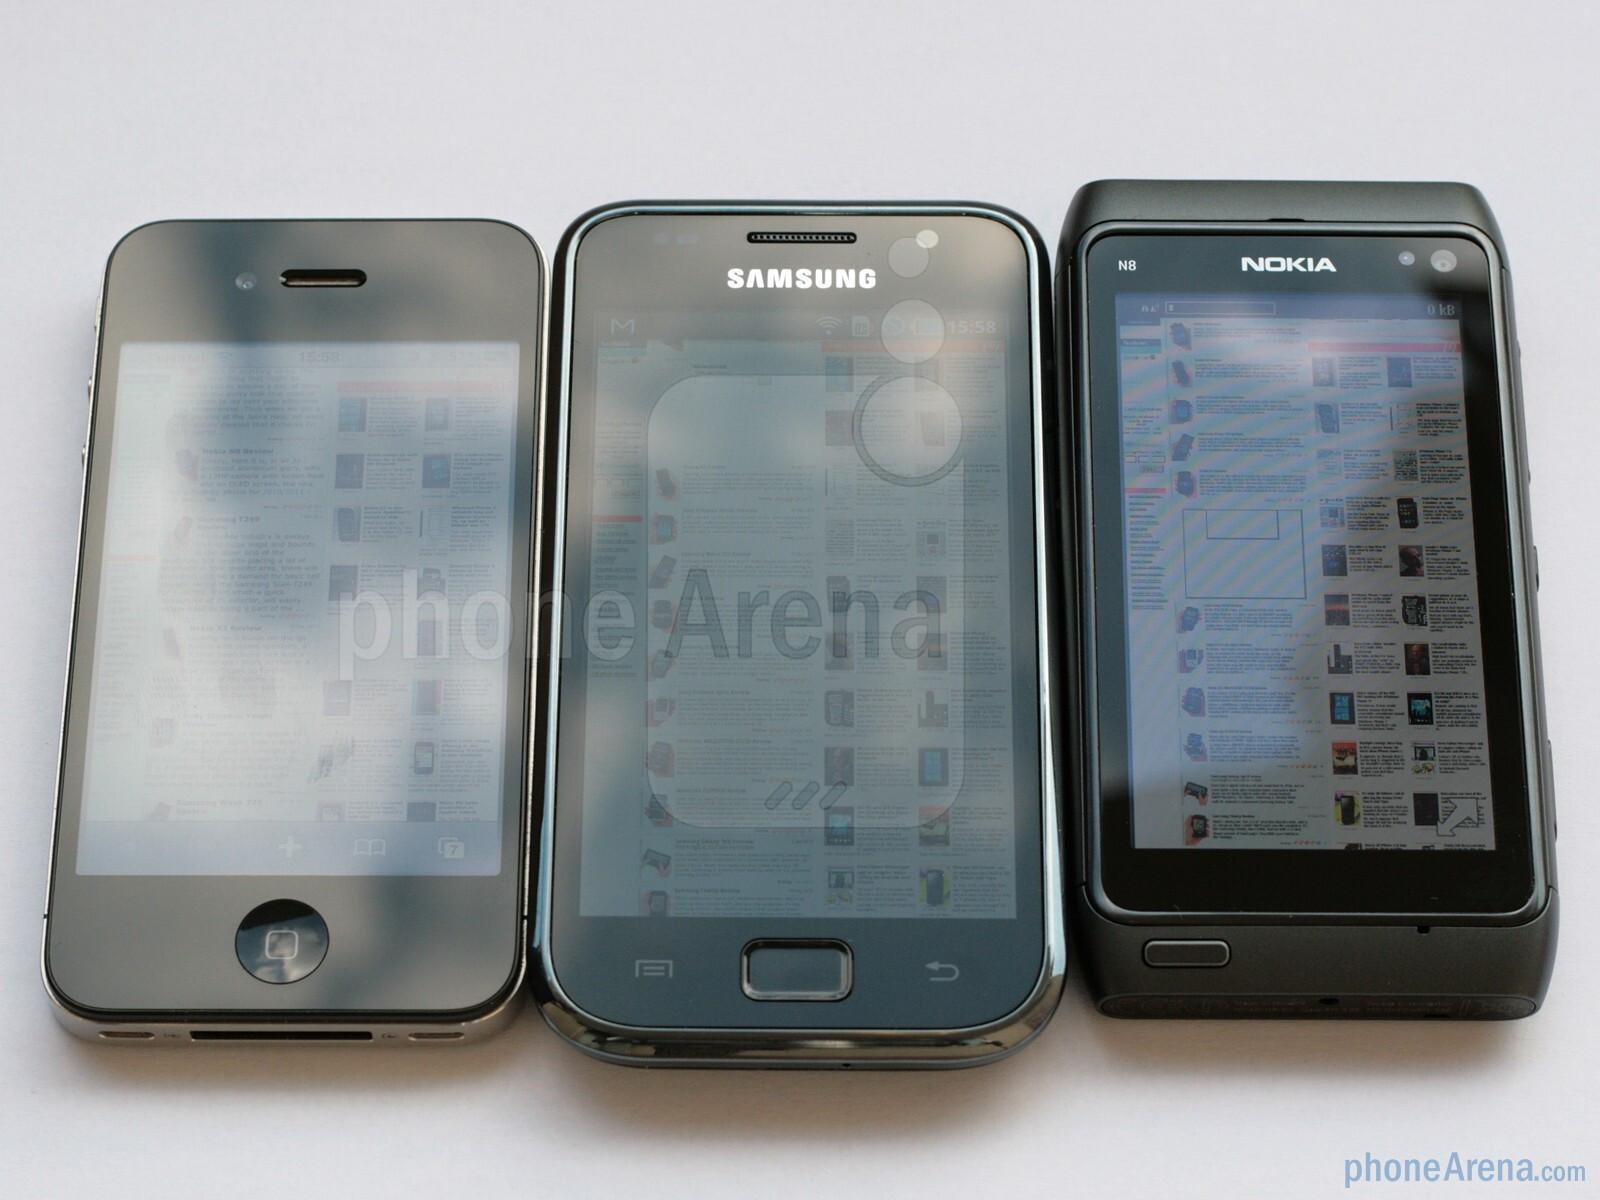 Nokia N8 vs Apple iPhone 4 - PhoneArena